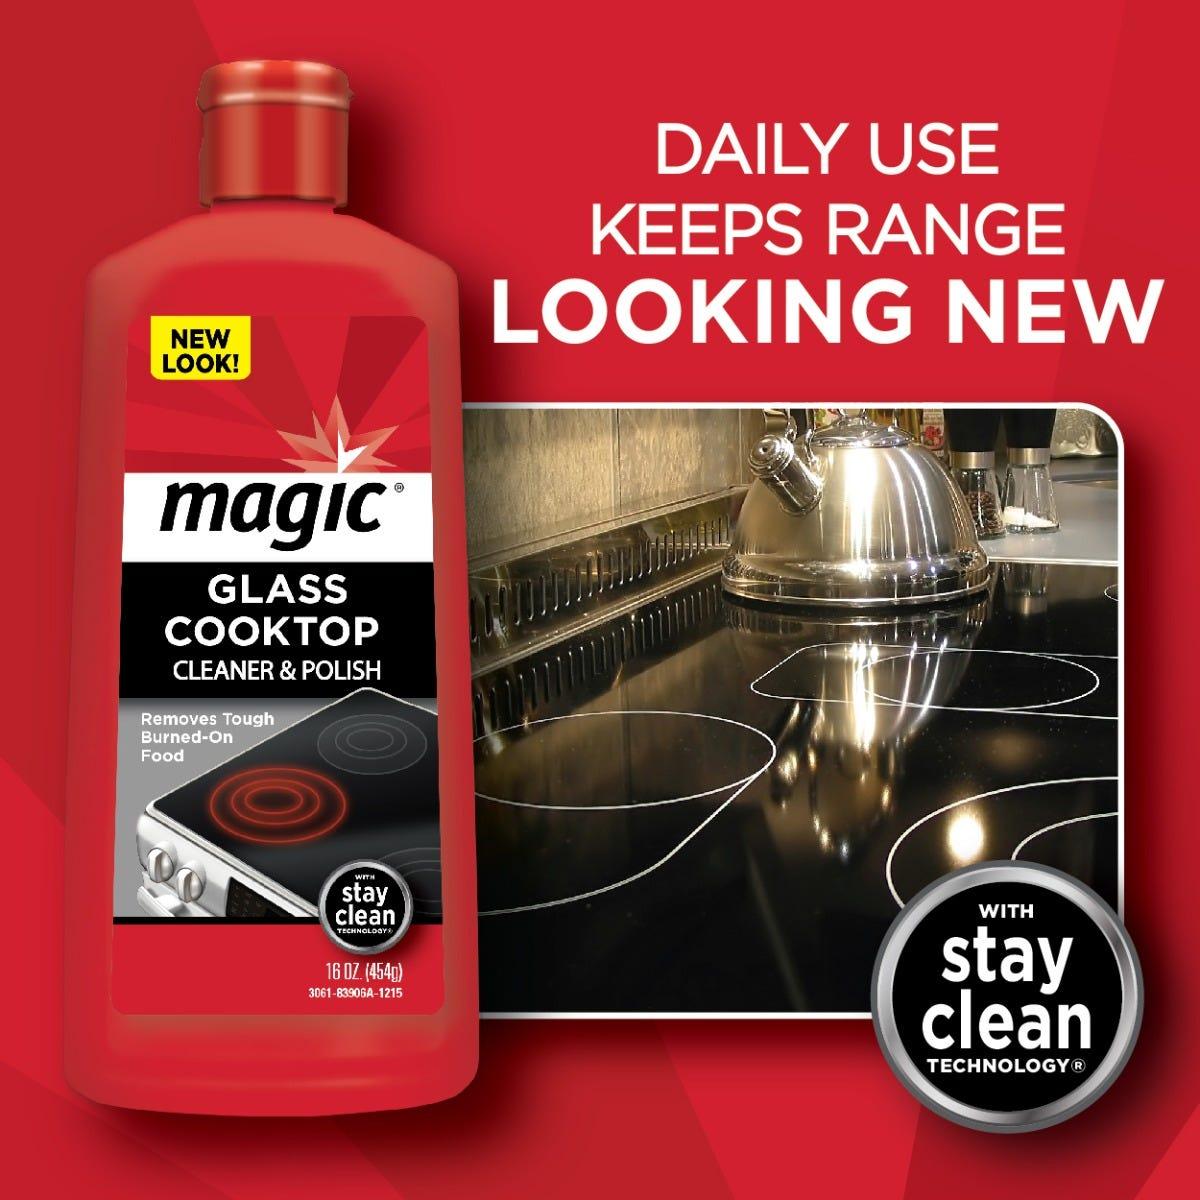 https://googone.com/media/catalog/product/m/a/magic_cooktop_cleaner_polish_beauty.jpg